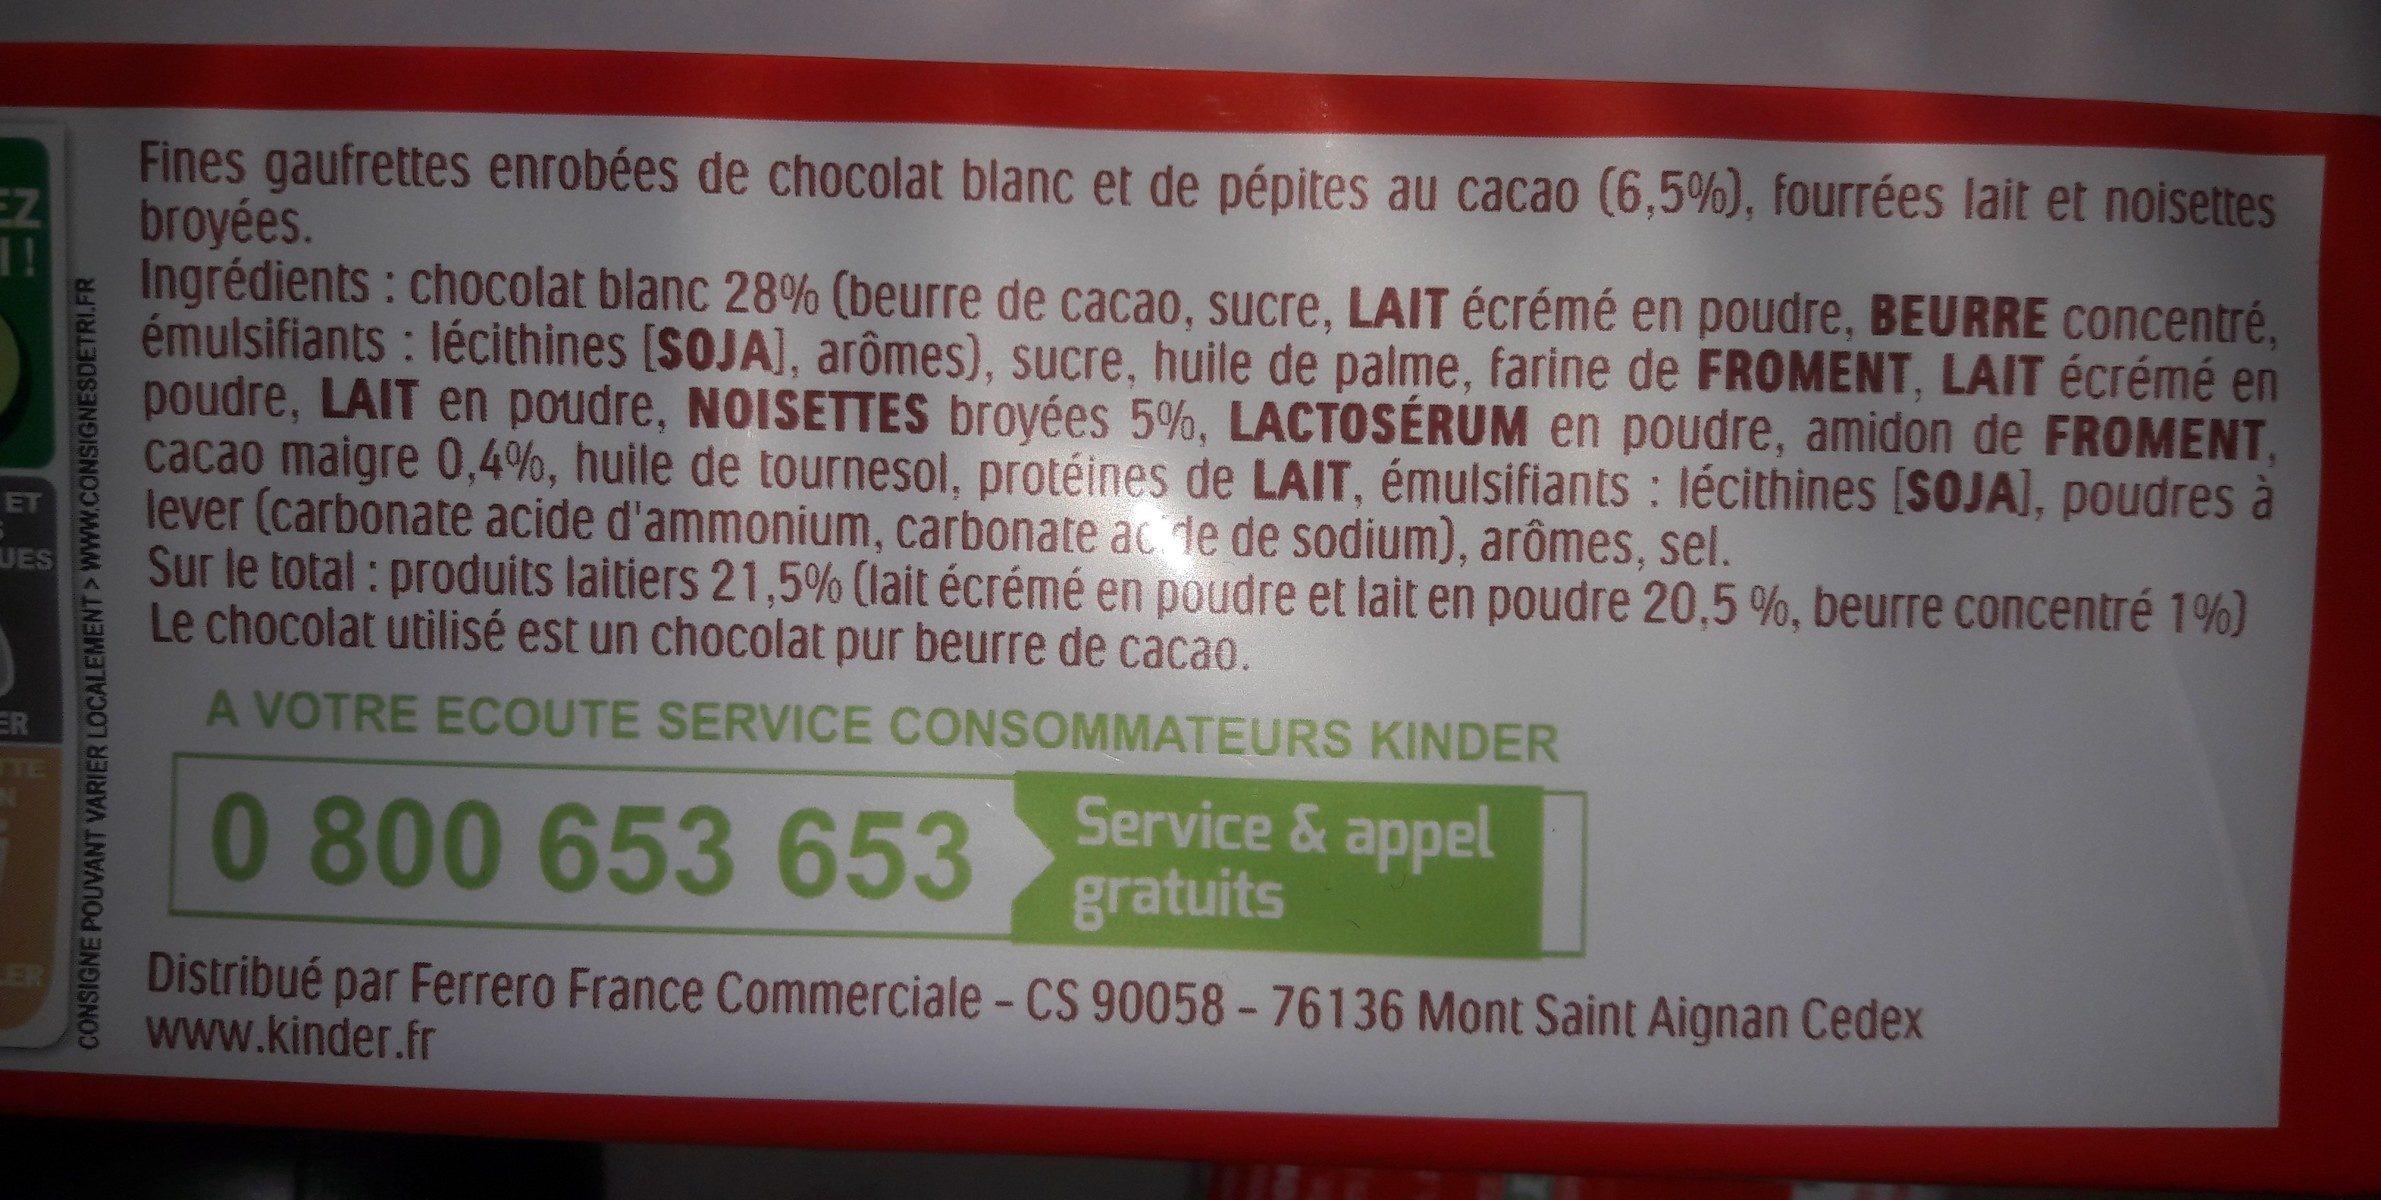 Kinder bueno white gaufrettes enrobees de chocolat blanc 8 x2 barres - Ingrédients - fr